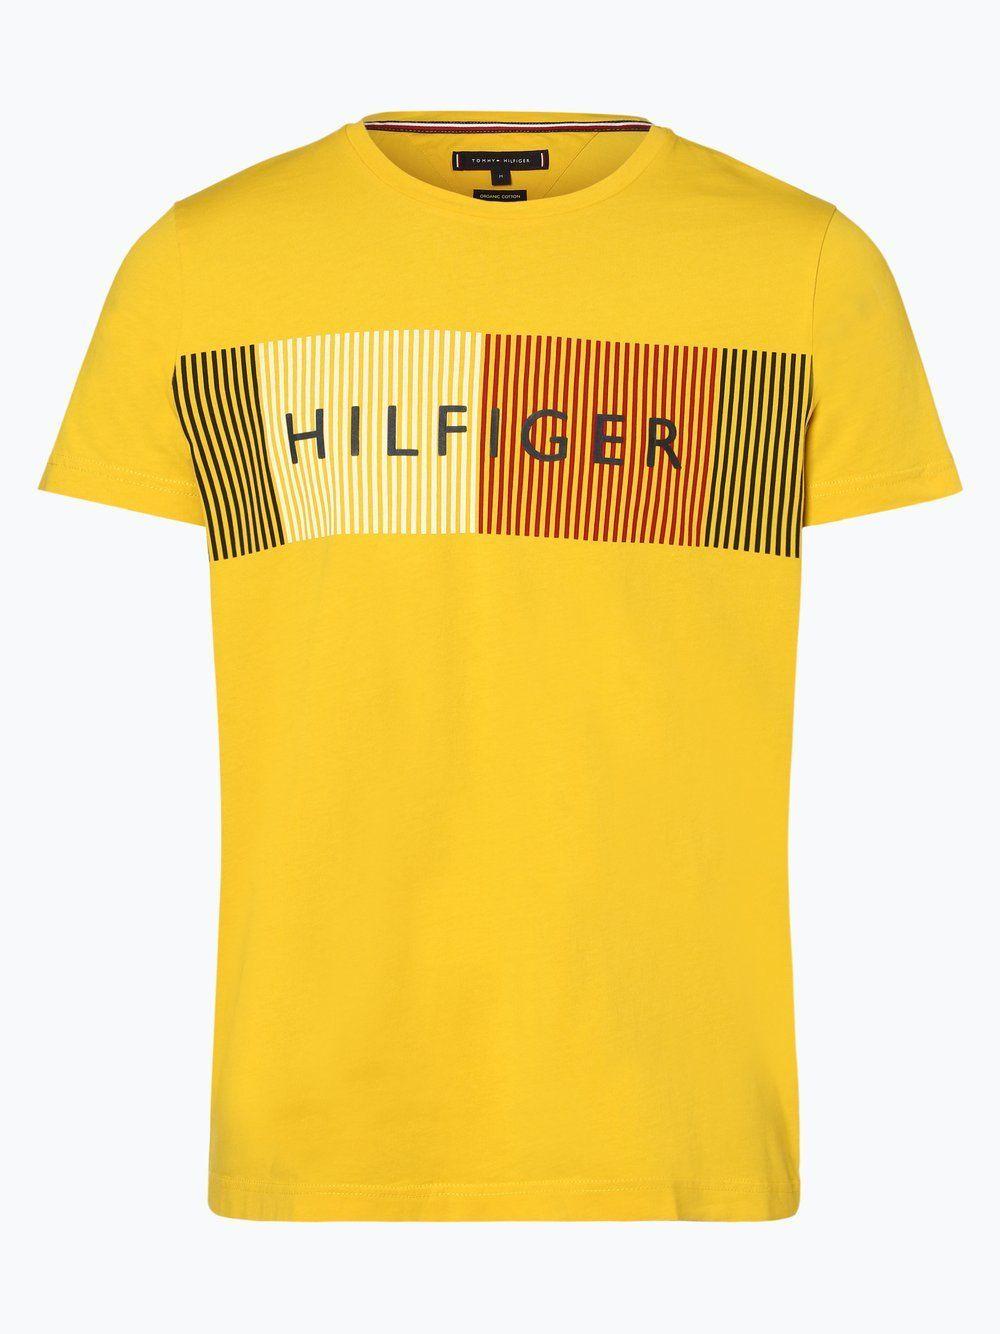 Tommy Hilfiger Herren T Shirt Online Kaufen Herren Hilfiger Kaufen Online Shirt Tommy Tshirt Men S Shirts And Tops Men Shirt Style Shirts